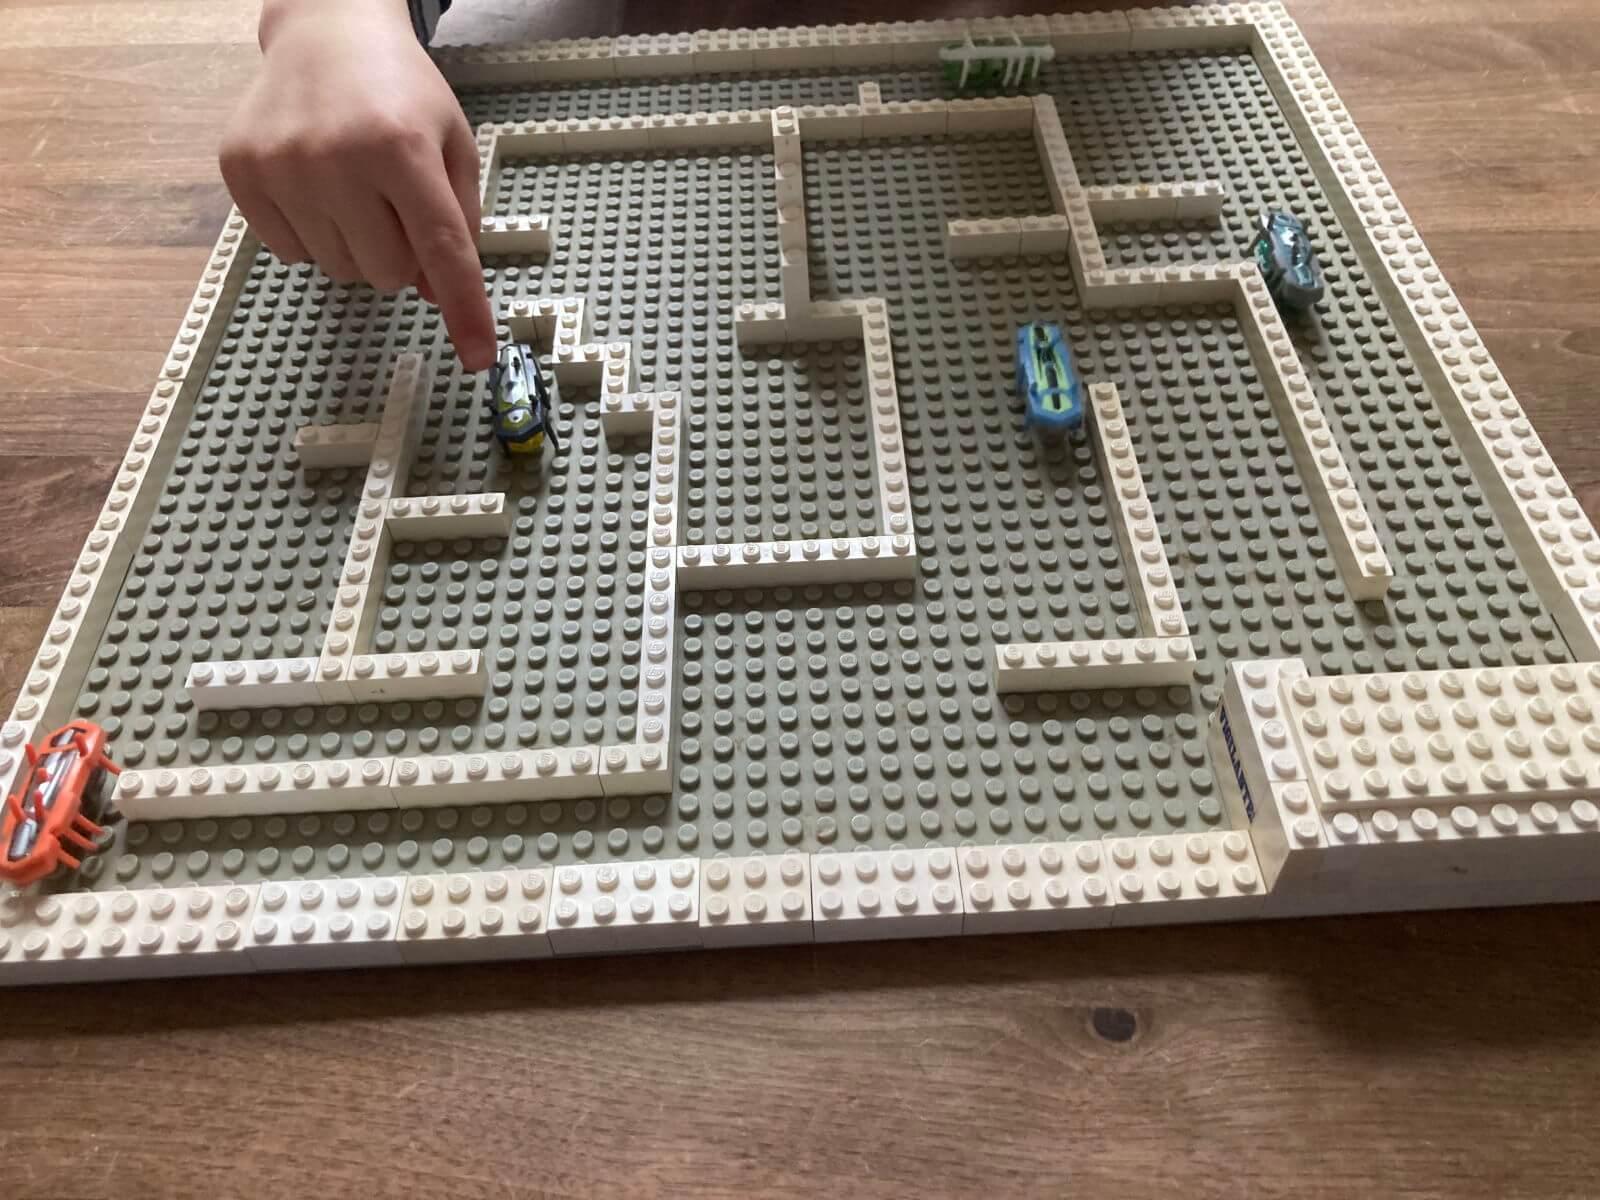 Hexbug Nano Lego Maze